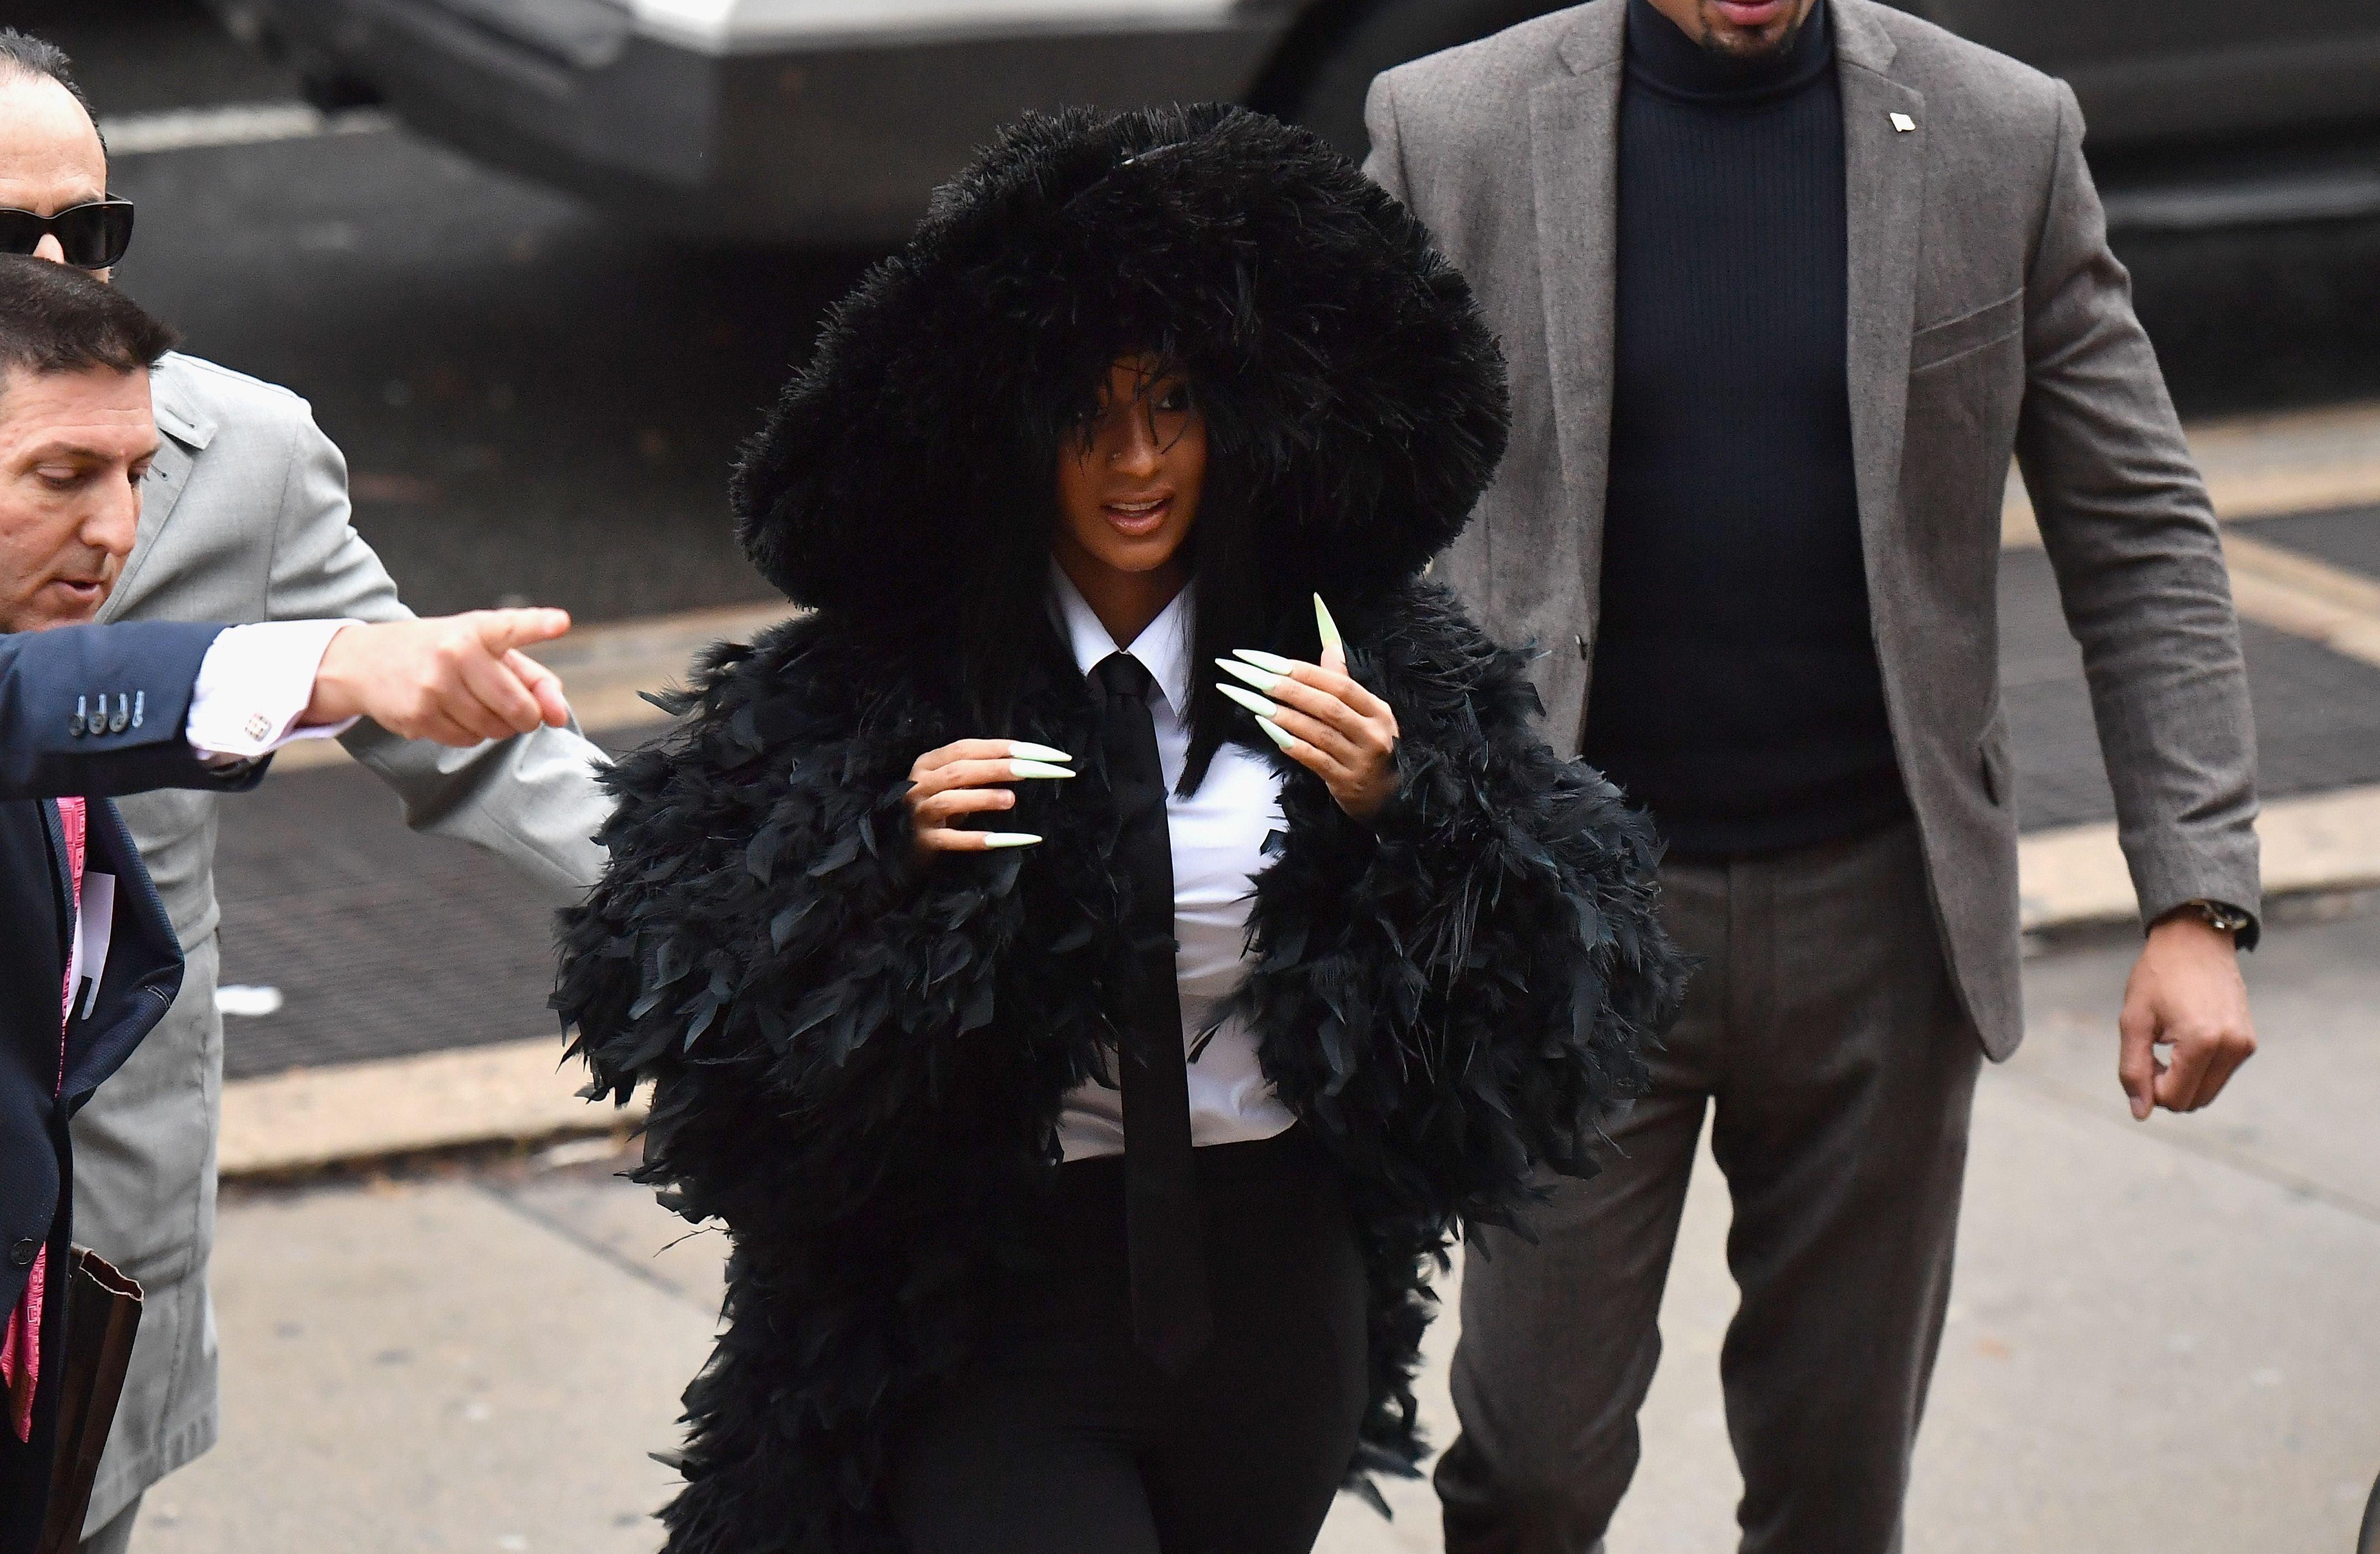 Cardi B Makes Glamorous Court Appearance in Long Train Coat